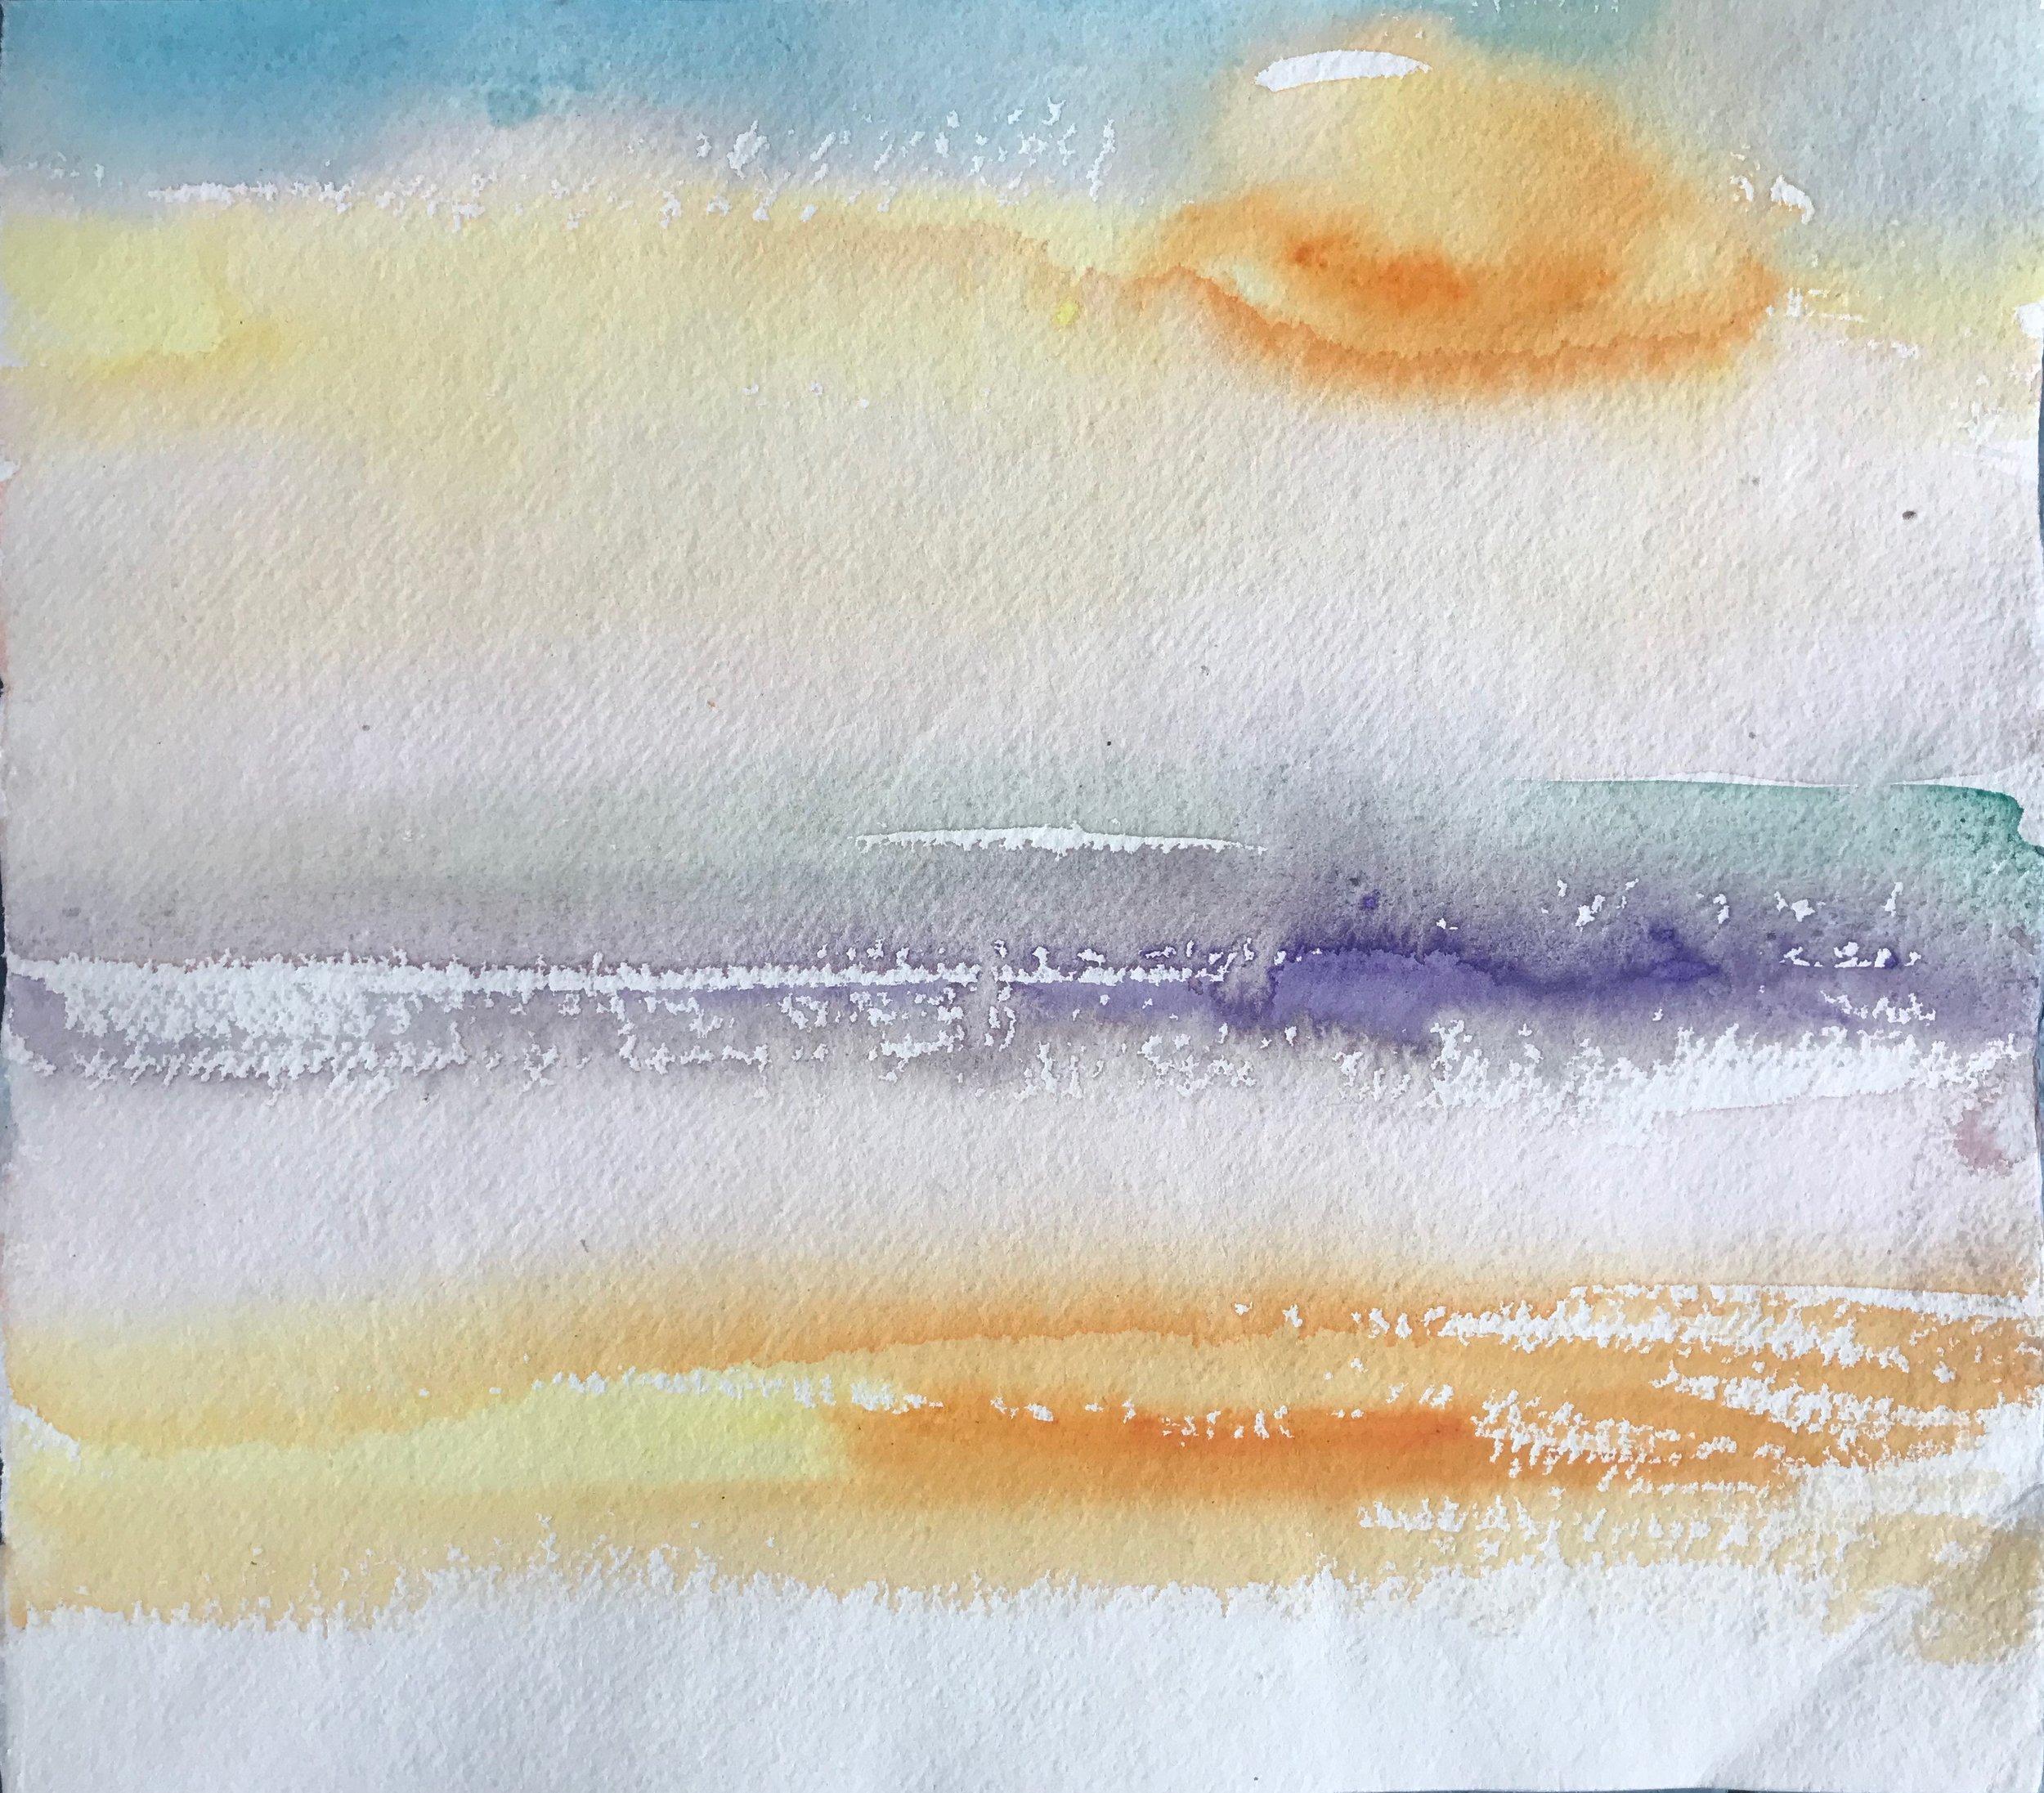 Sunrise study 5 (Ganges),30x34cm.jpeg